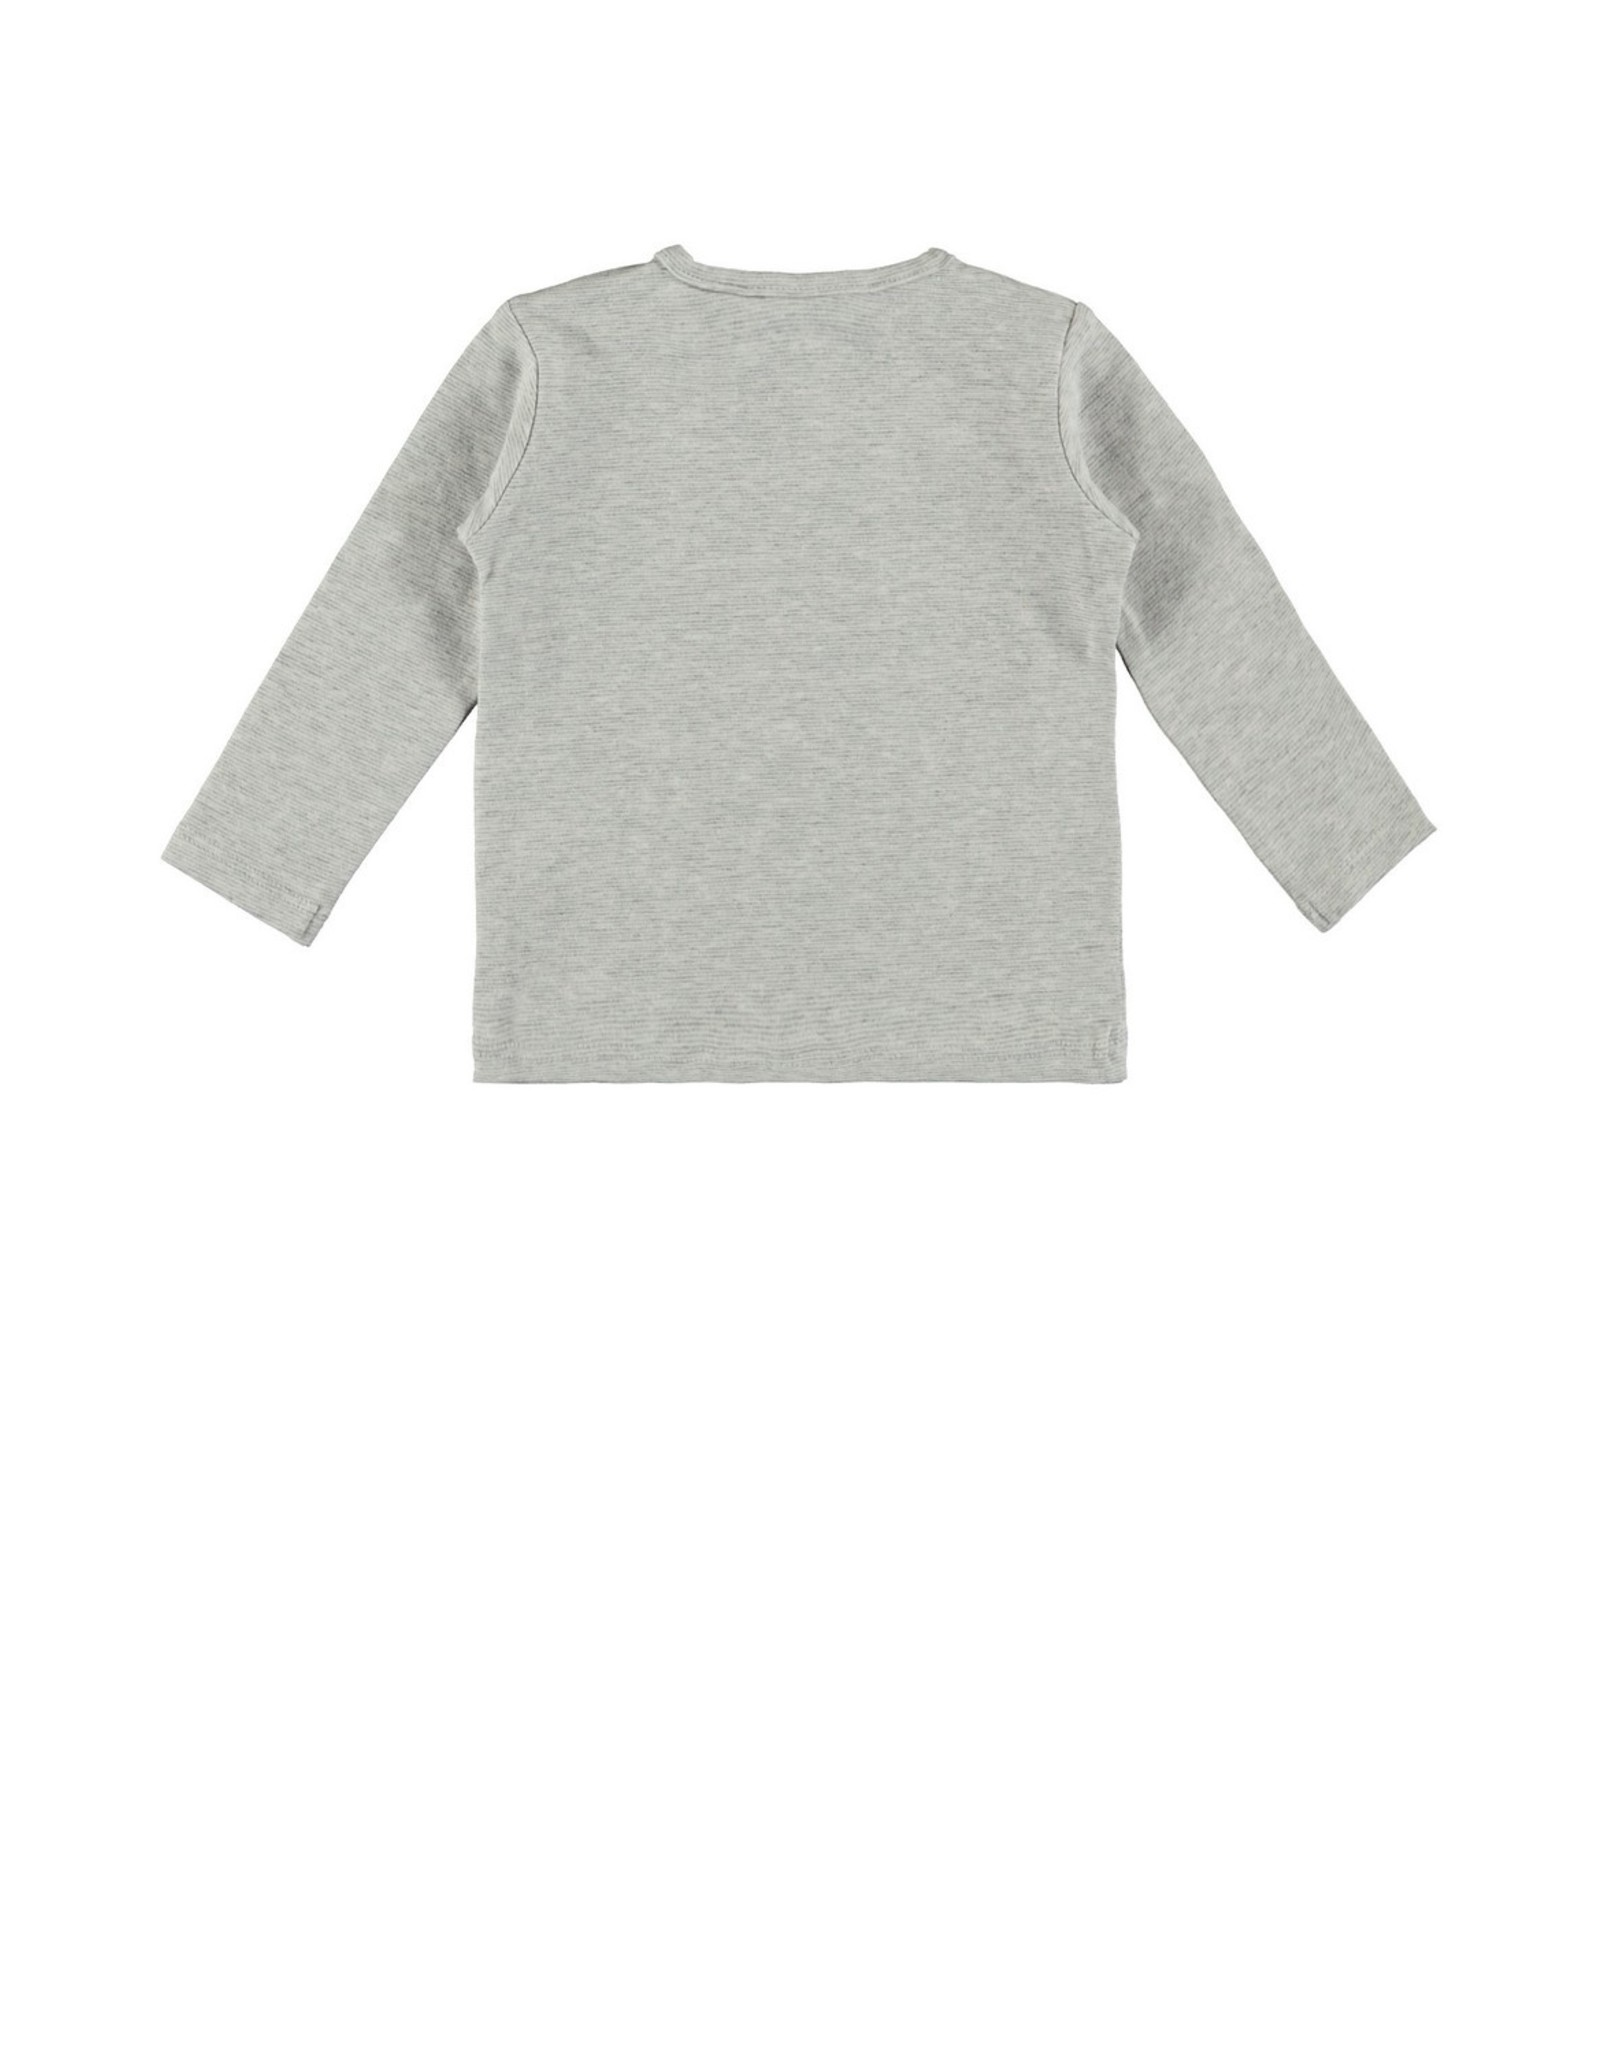 Bampidano New Born T-shirt l/s melange y/d stripe GIVE ME A SMILE, grey melee stripe